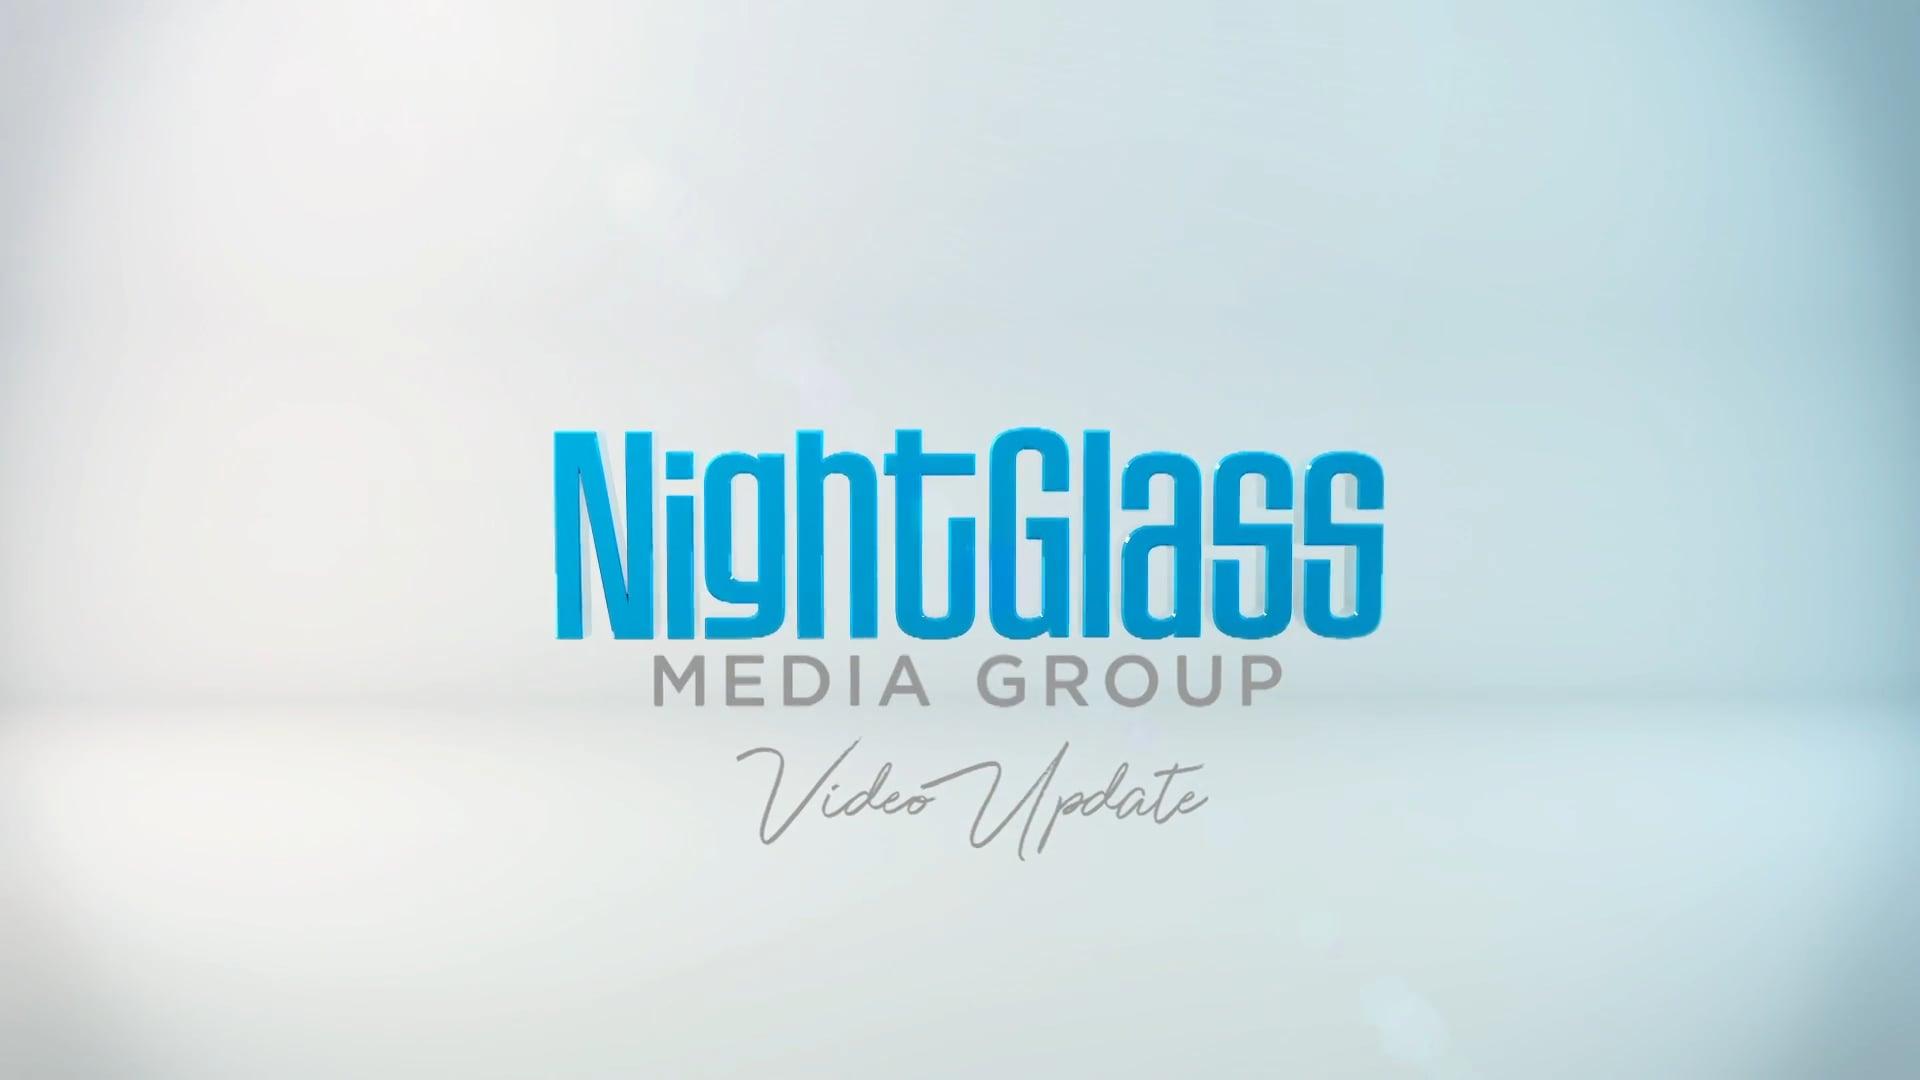 NightGlass Video Update July 2018